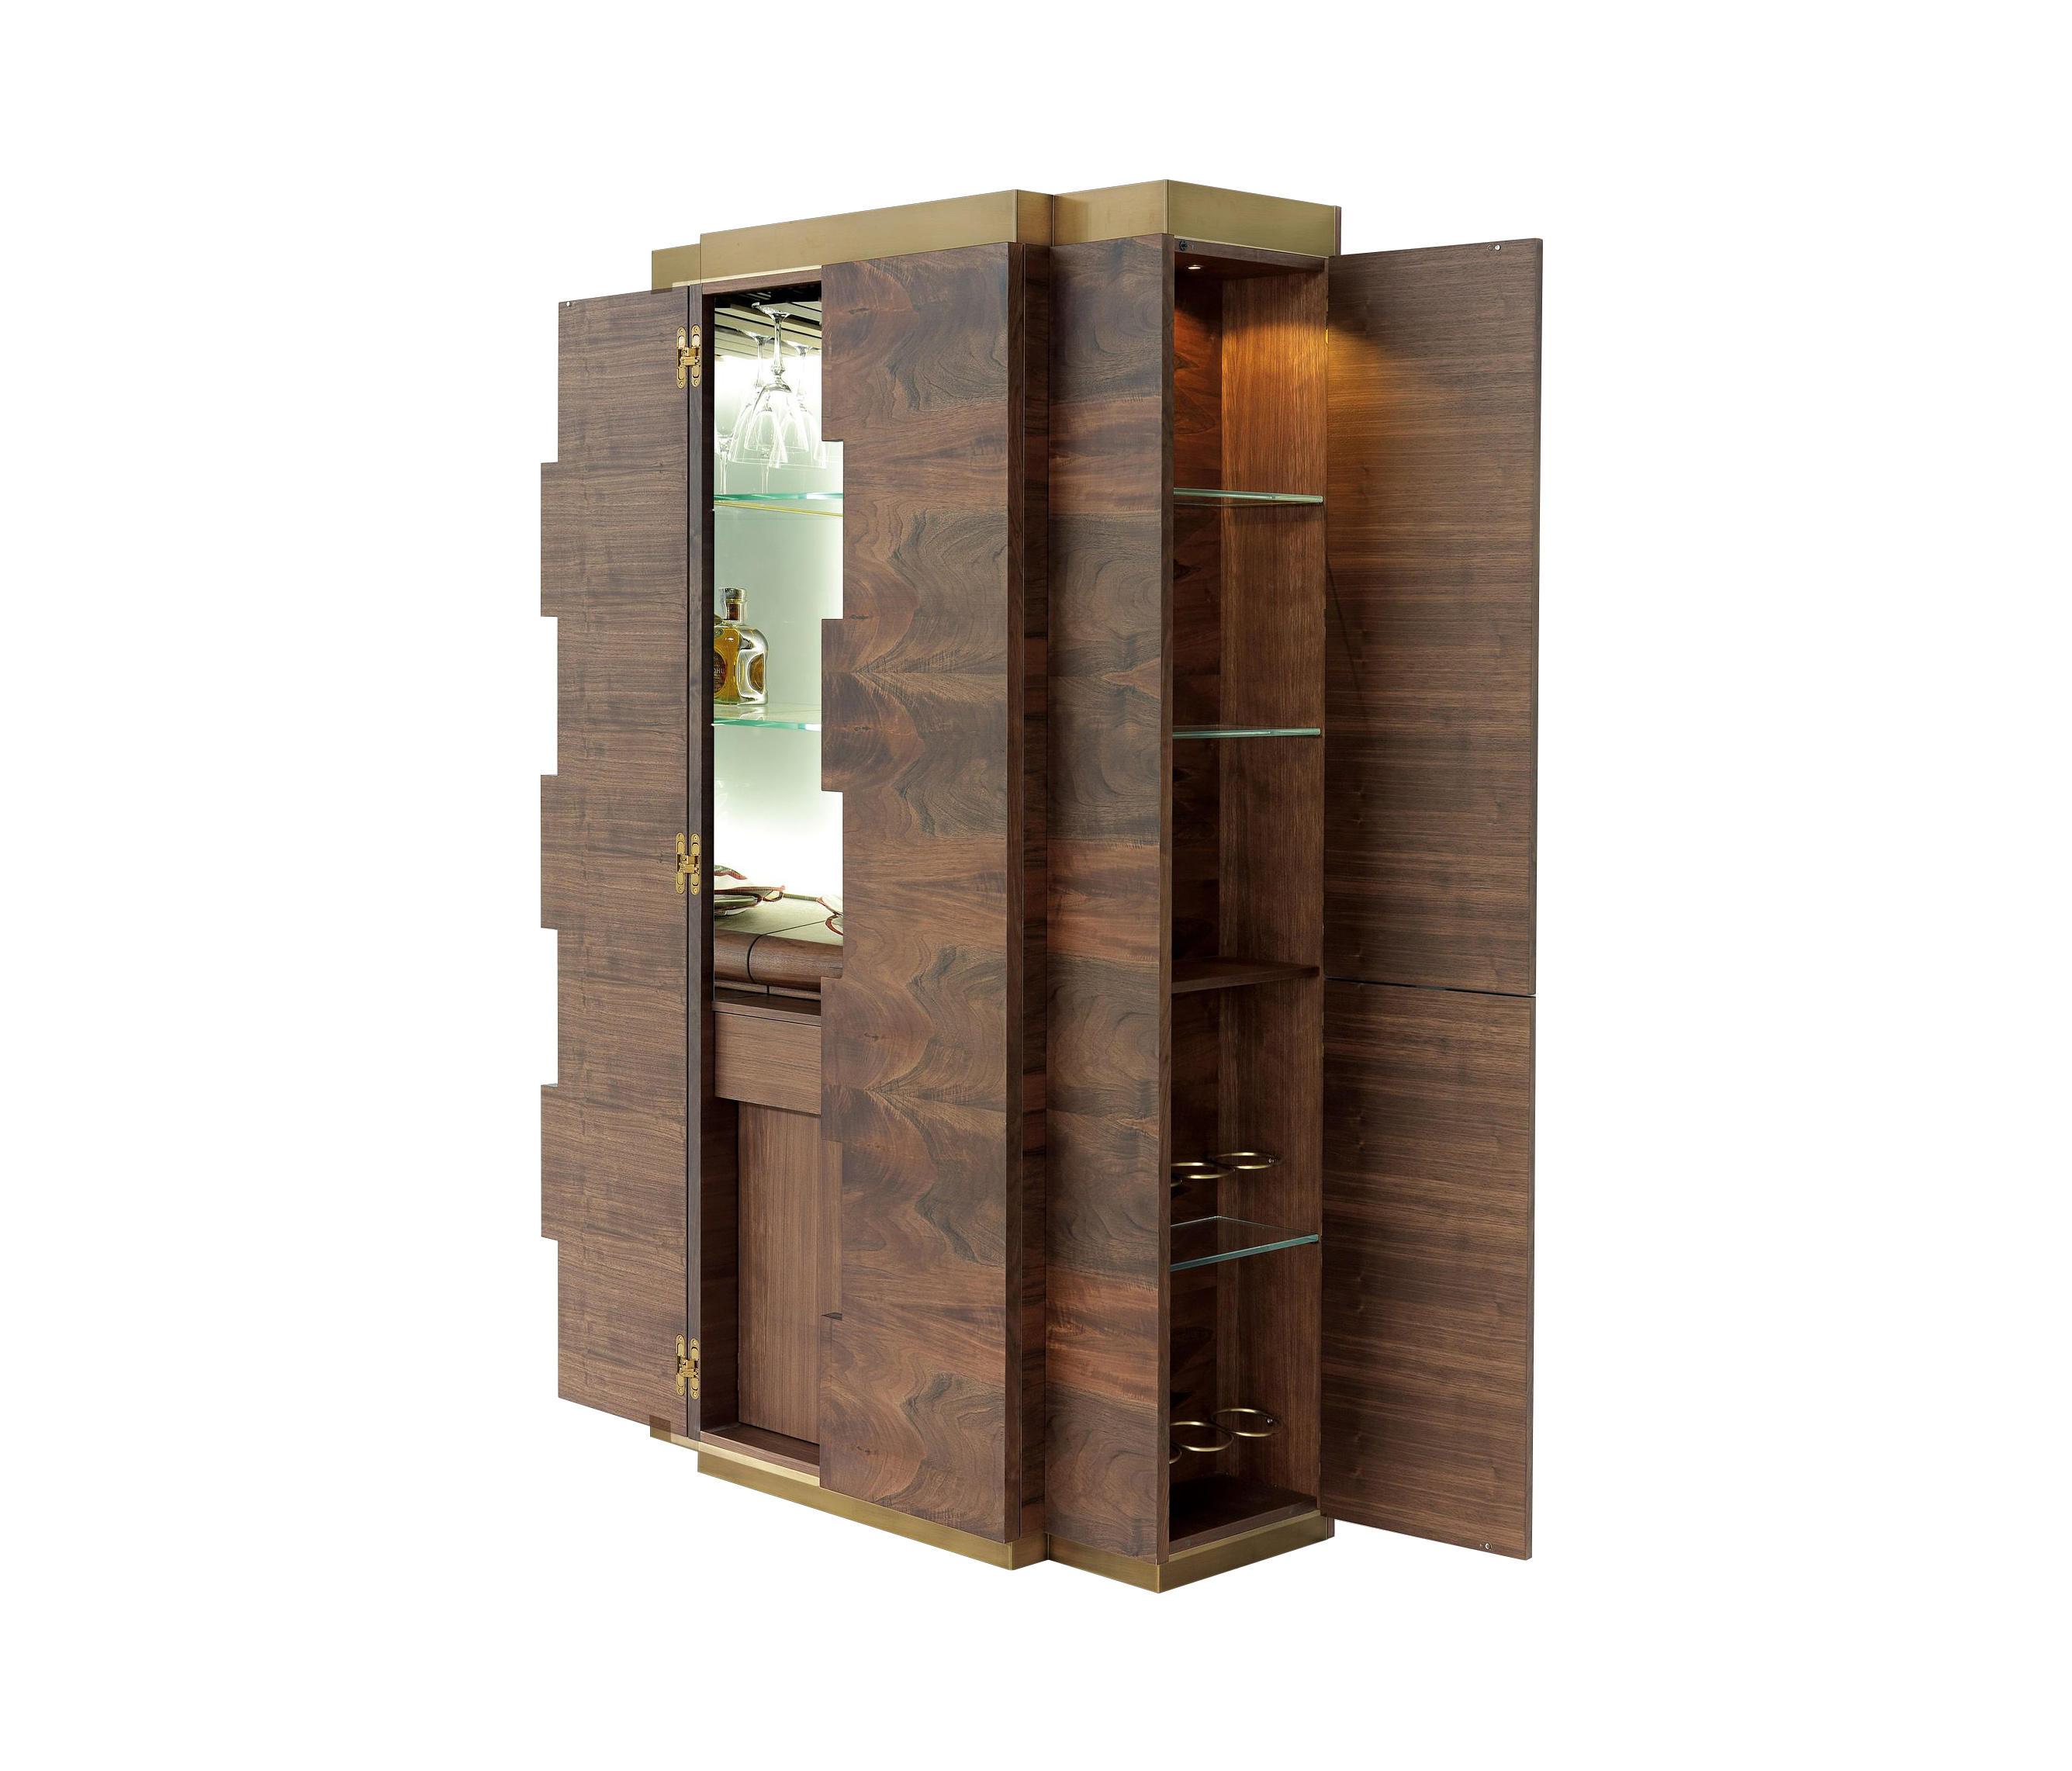 unico bar furniture barschr nke hausbars von. Black Bedroom Furniture Sets. Home Design Ideas